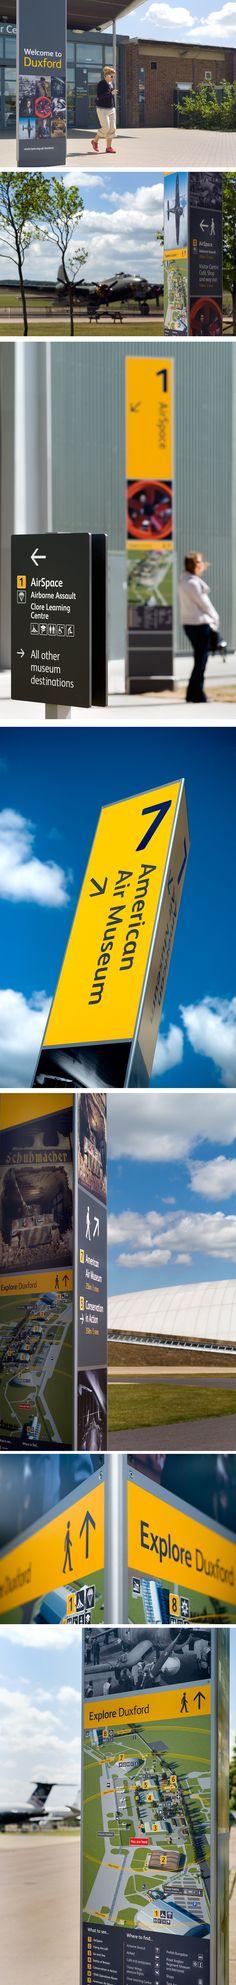 Wayfinding & signage design for the Duxford air museum. Designed by ABG Design #sign #design #signagedesign #navigation #graphic #design #graphicdesign #designinspiration #printdesign #branding #orientation #museum #museumbrand #museumidentity #museumwayfinding #museumsignage